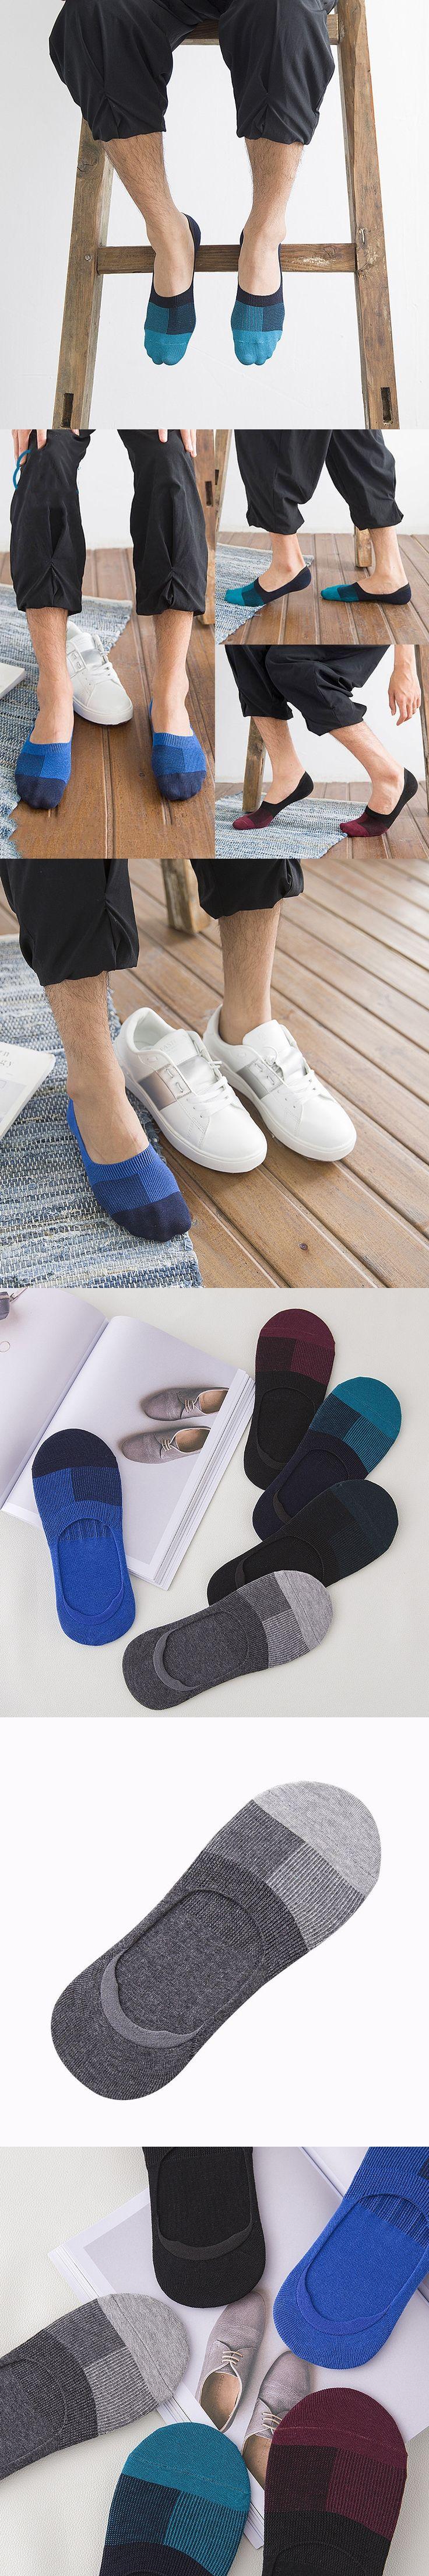 New Style Summer Men Cotton Socks Men's Business Dress Socks Contrast Color Low Cut Ankle Socks Male Amazing no show socks Male